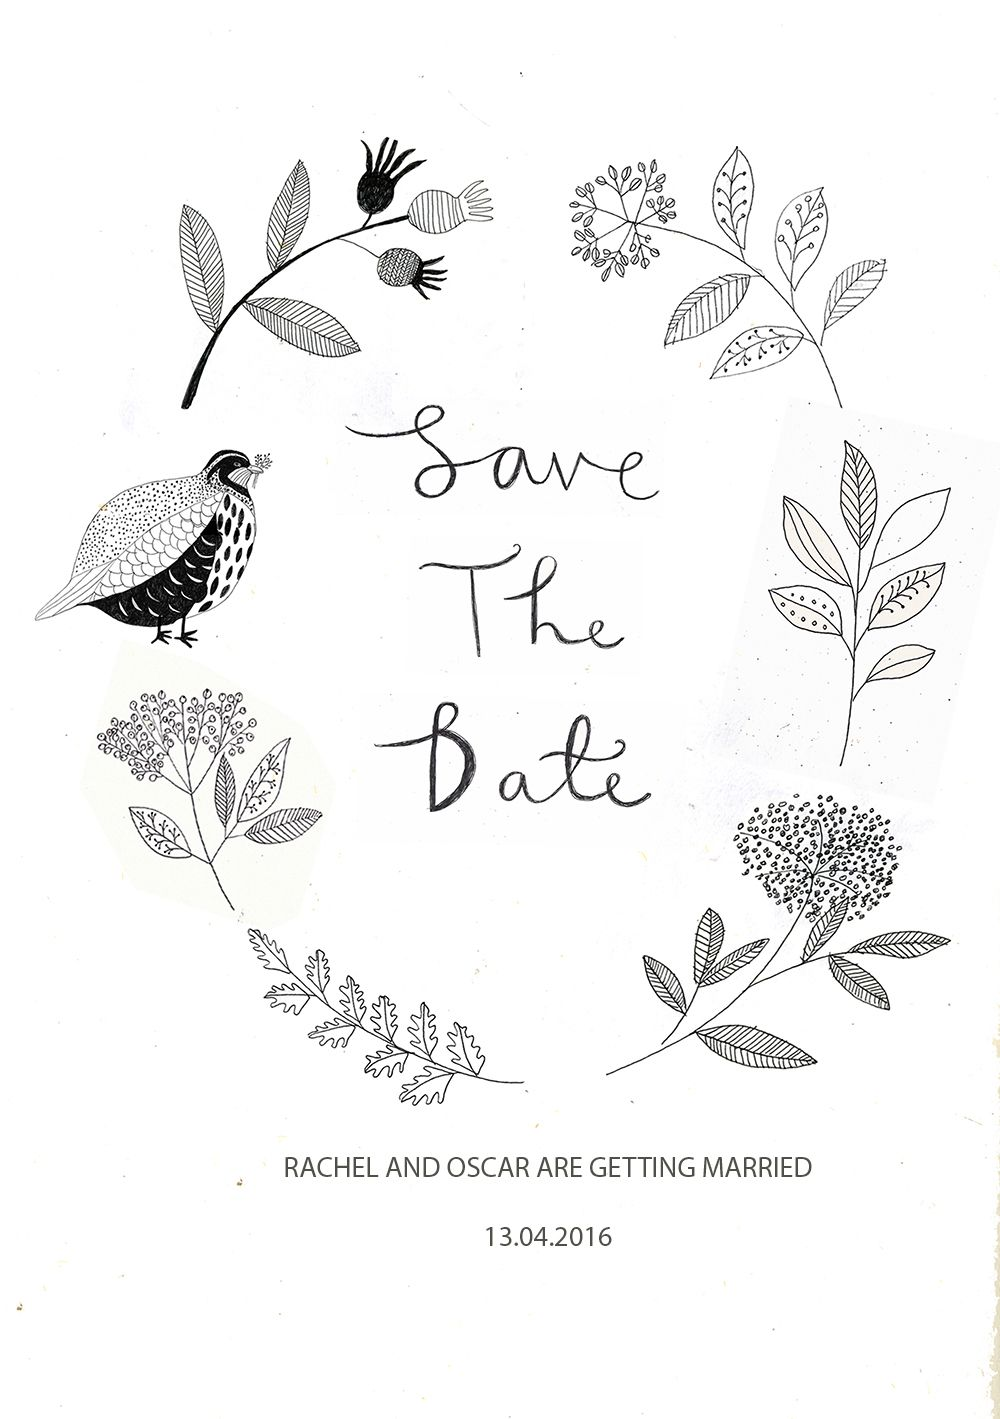 Save the date designed by Ryn Frank www.rynfrank.co.uk